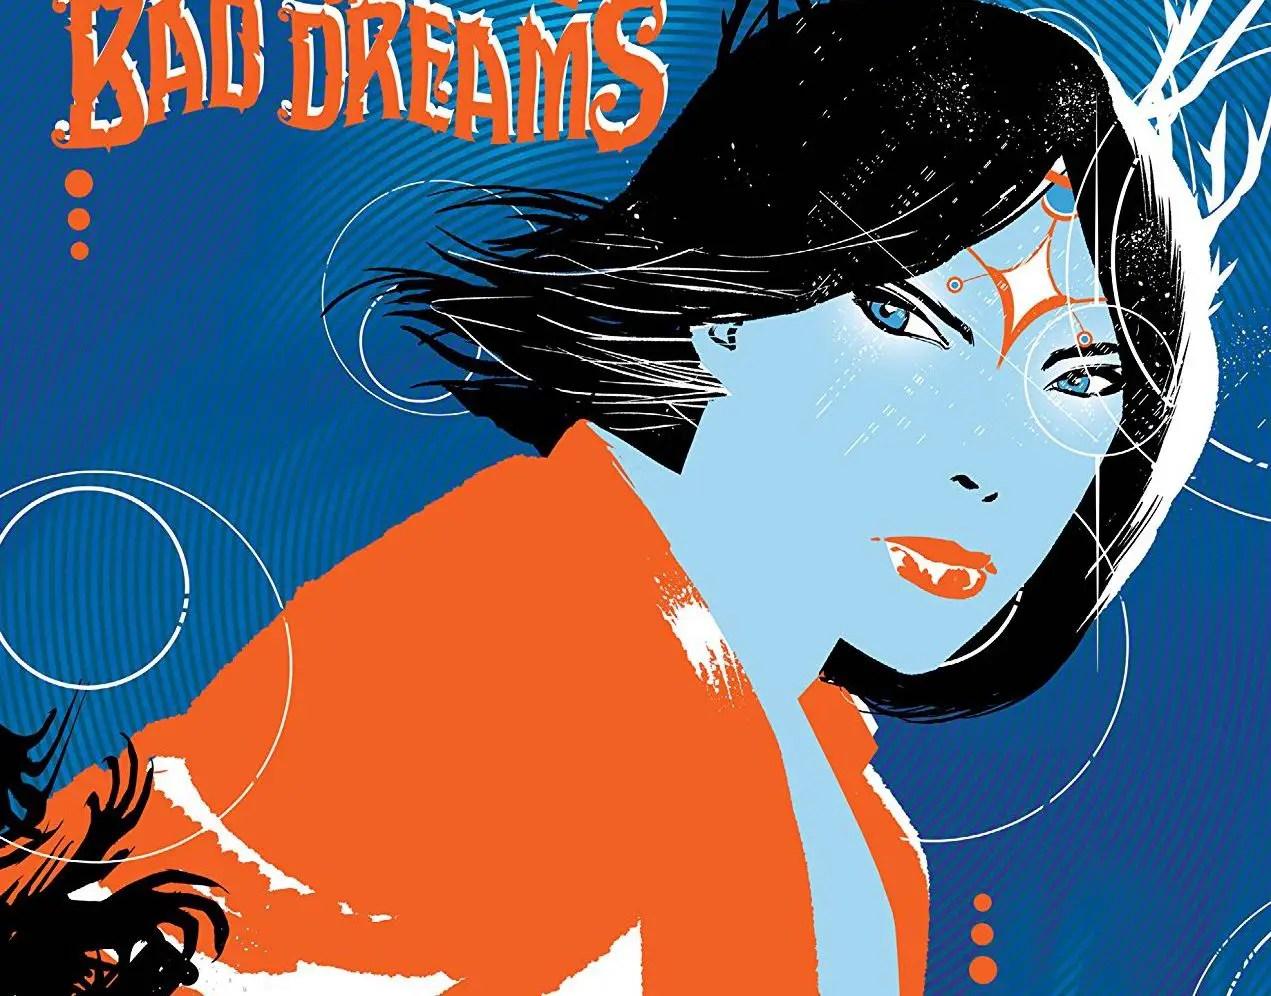 Queen of Bad Dreams Vol. 1 Review